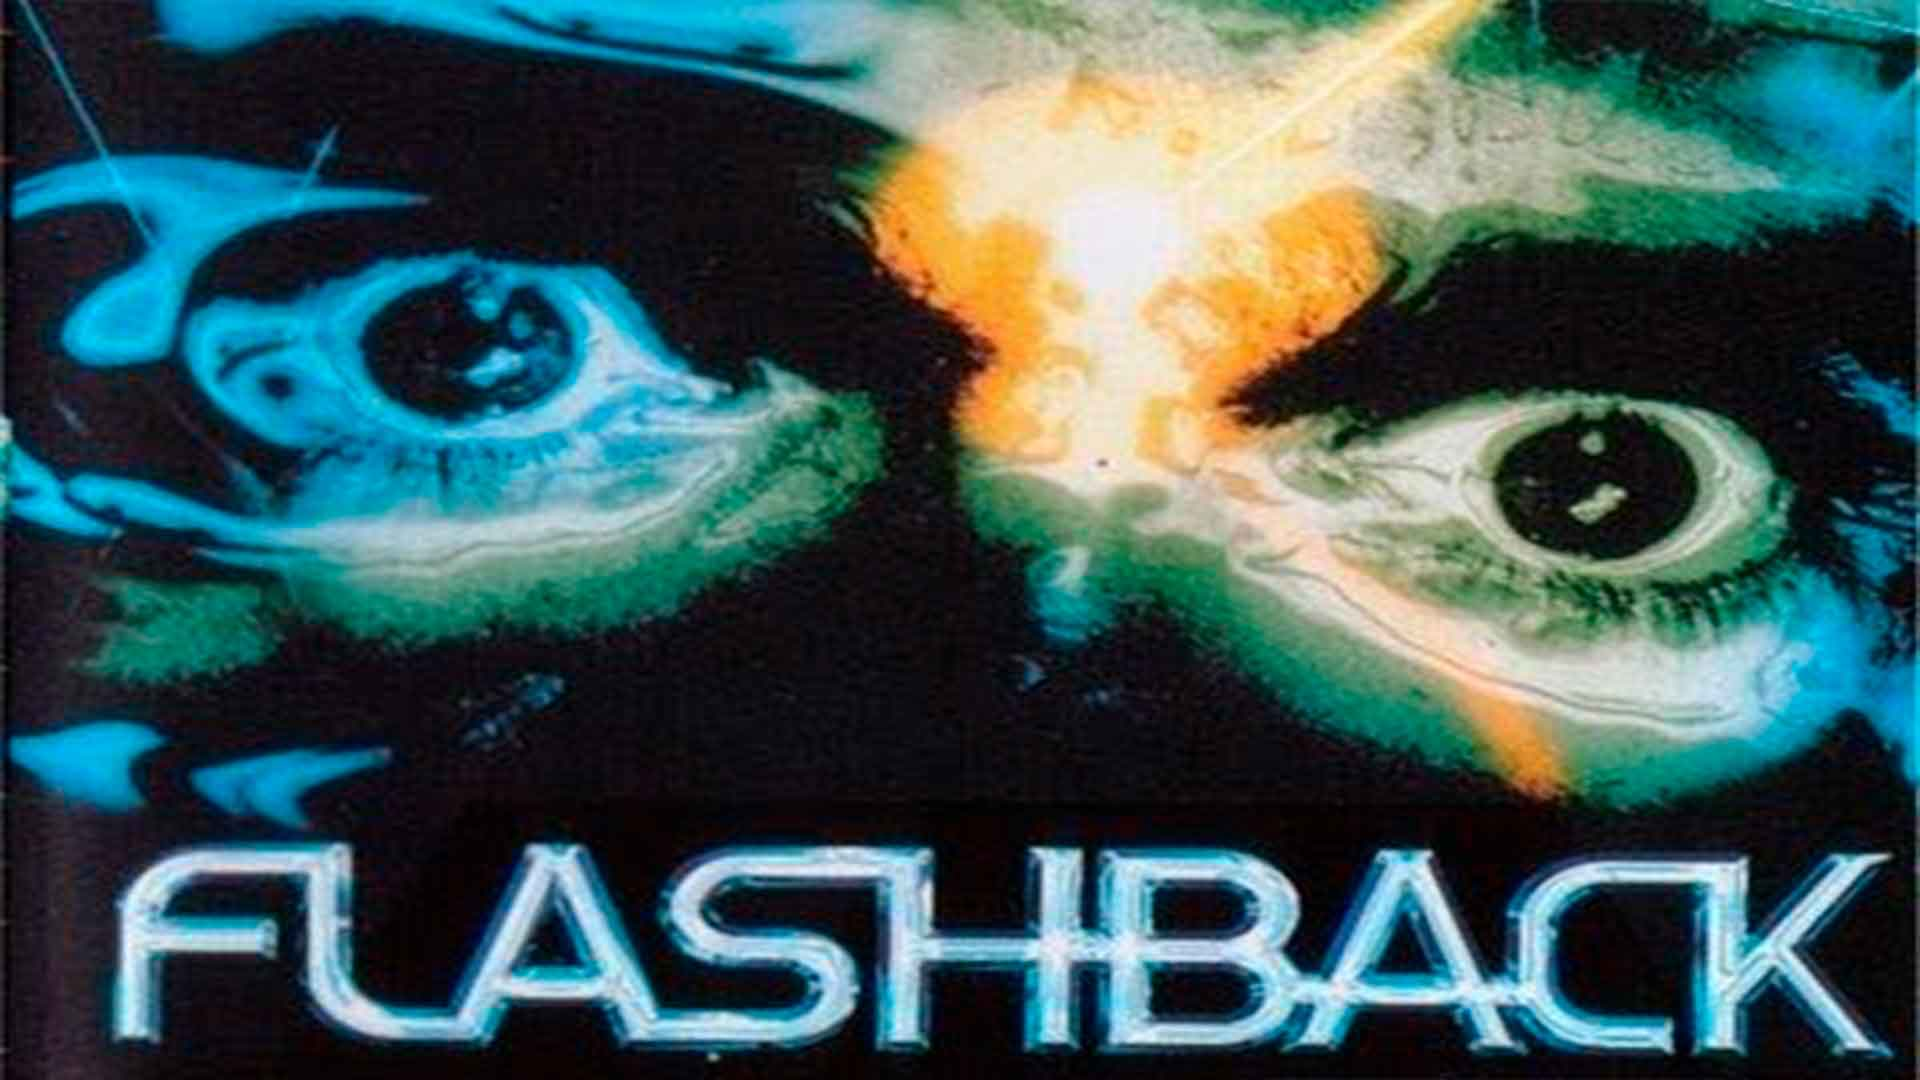 Flashback 2, GamersRD